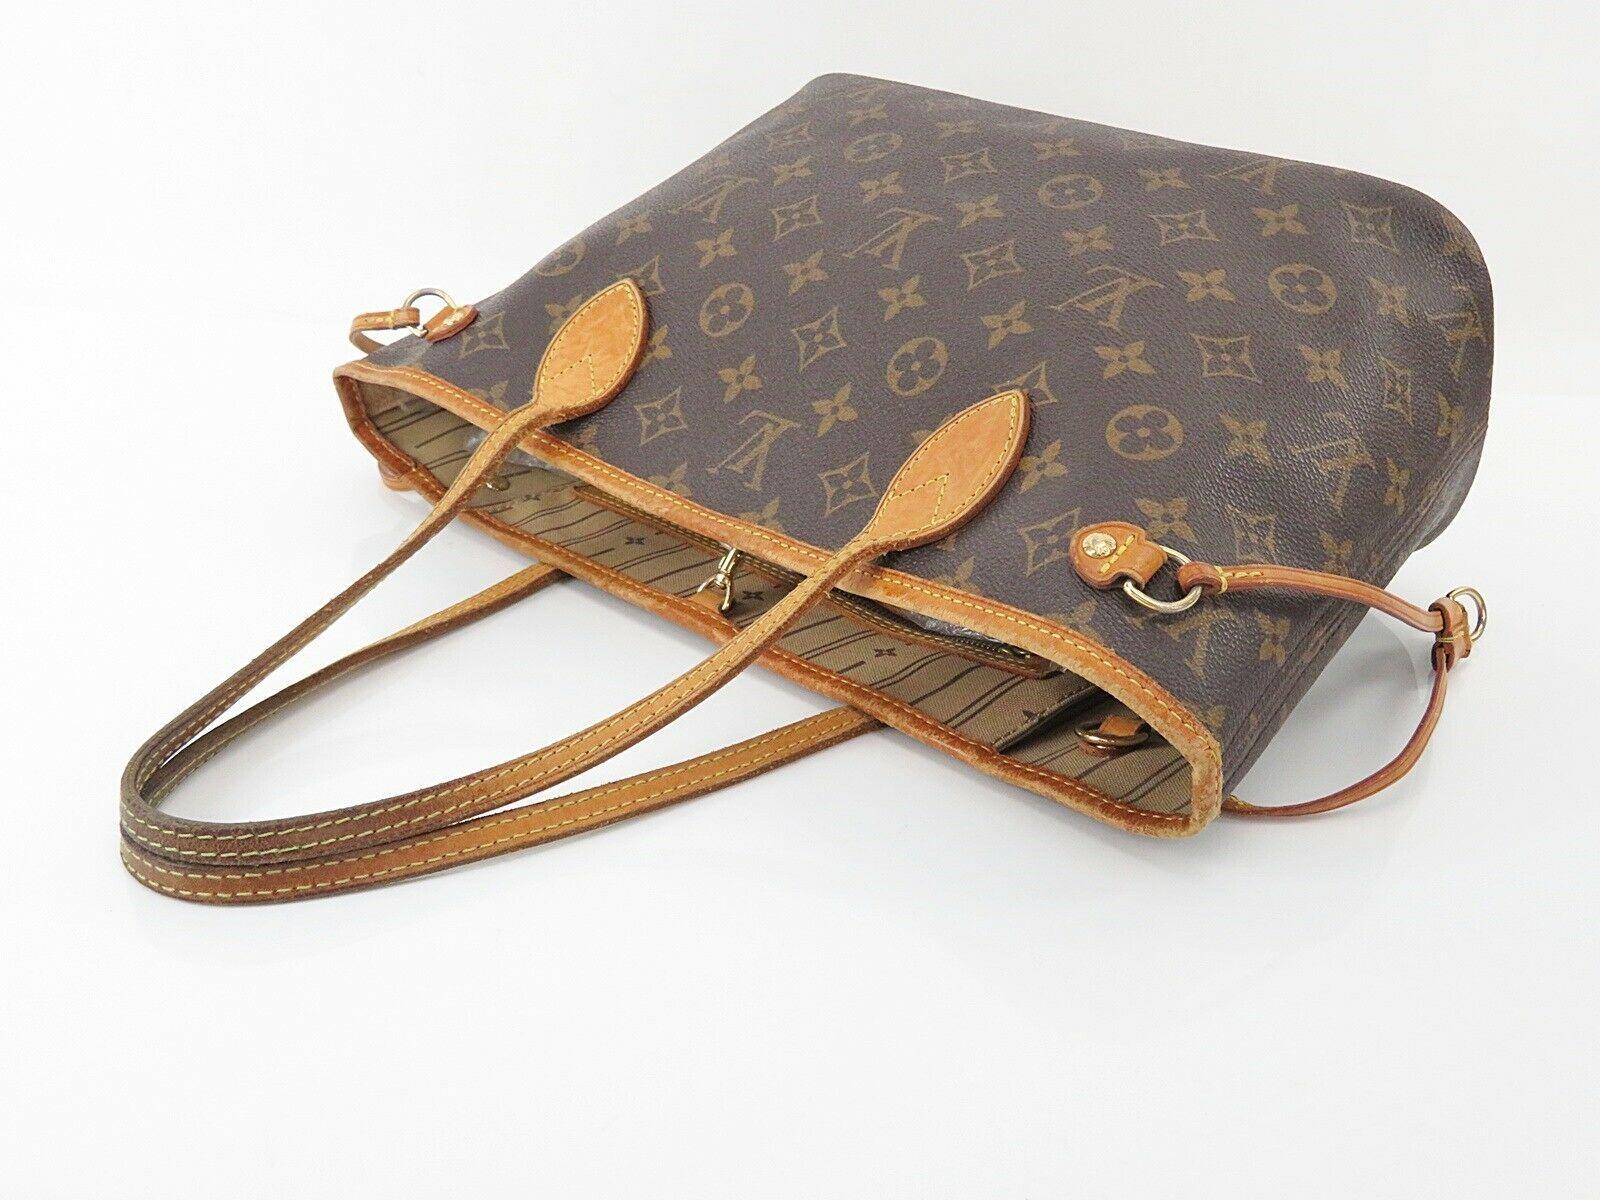 Authentic LOUIS VUITTON Neverfull PM Monogram Tote Bag Purse #28776